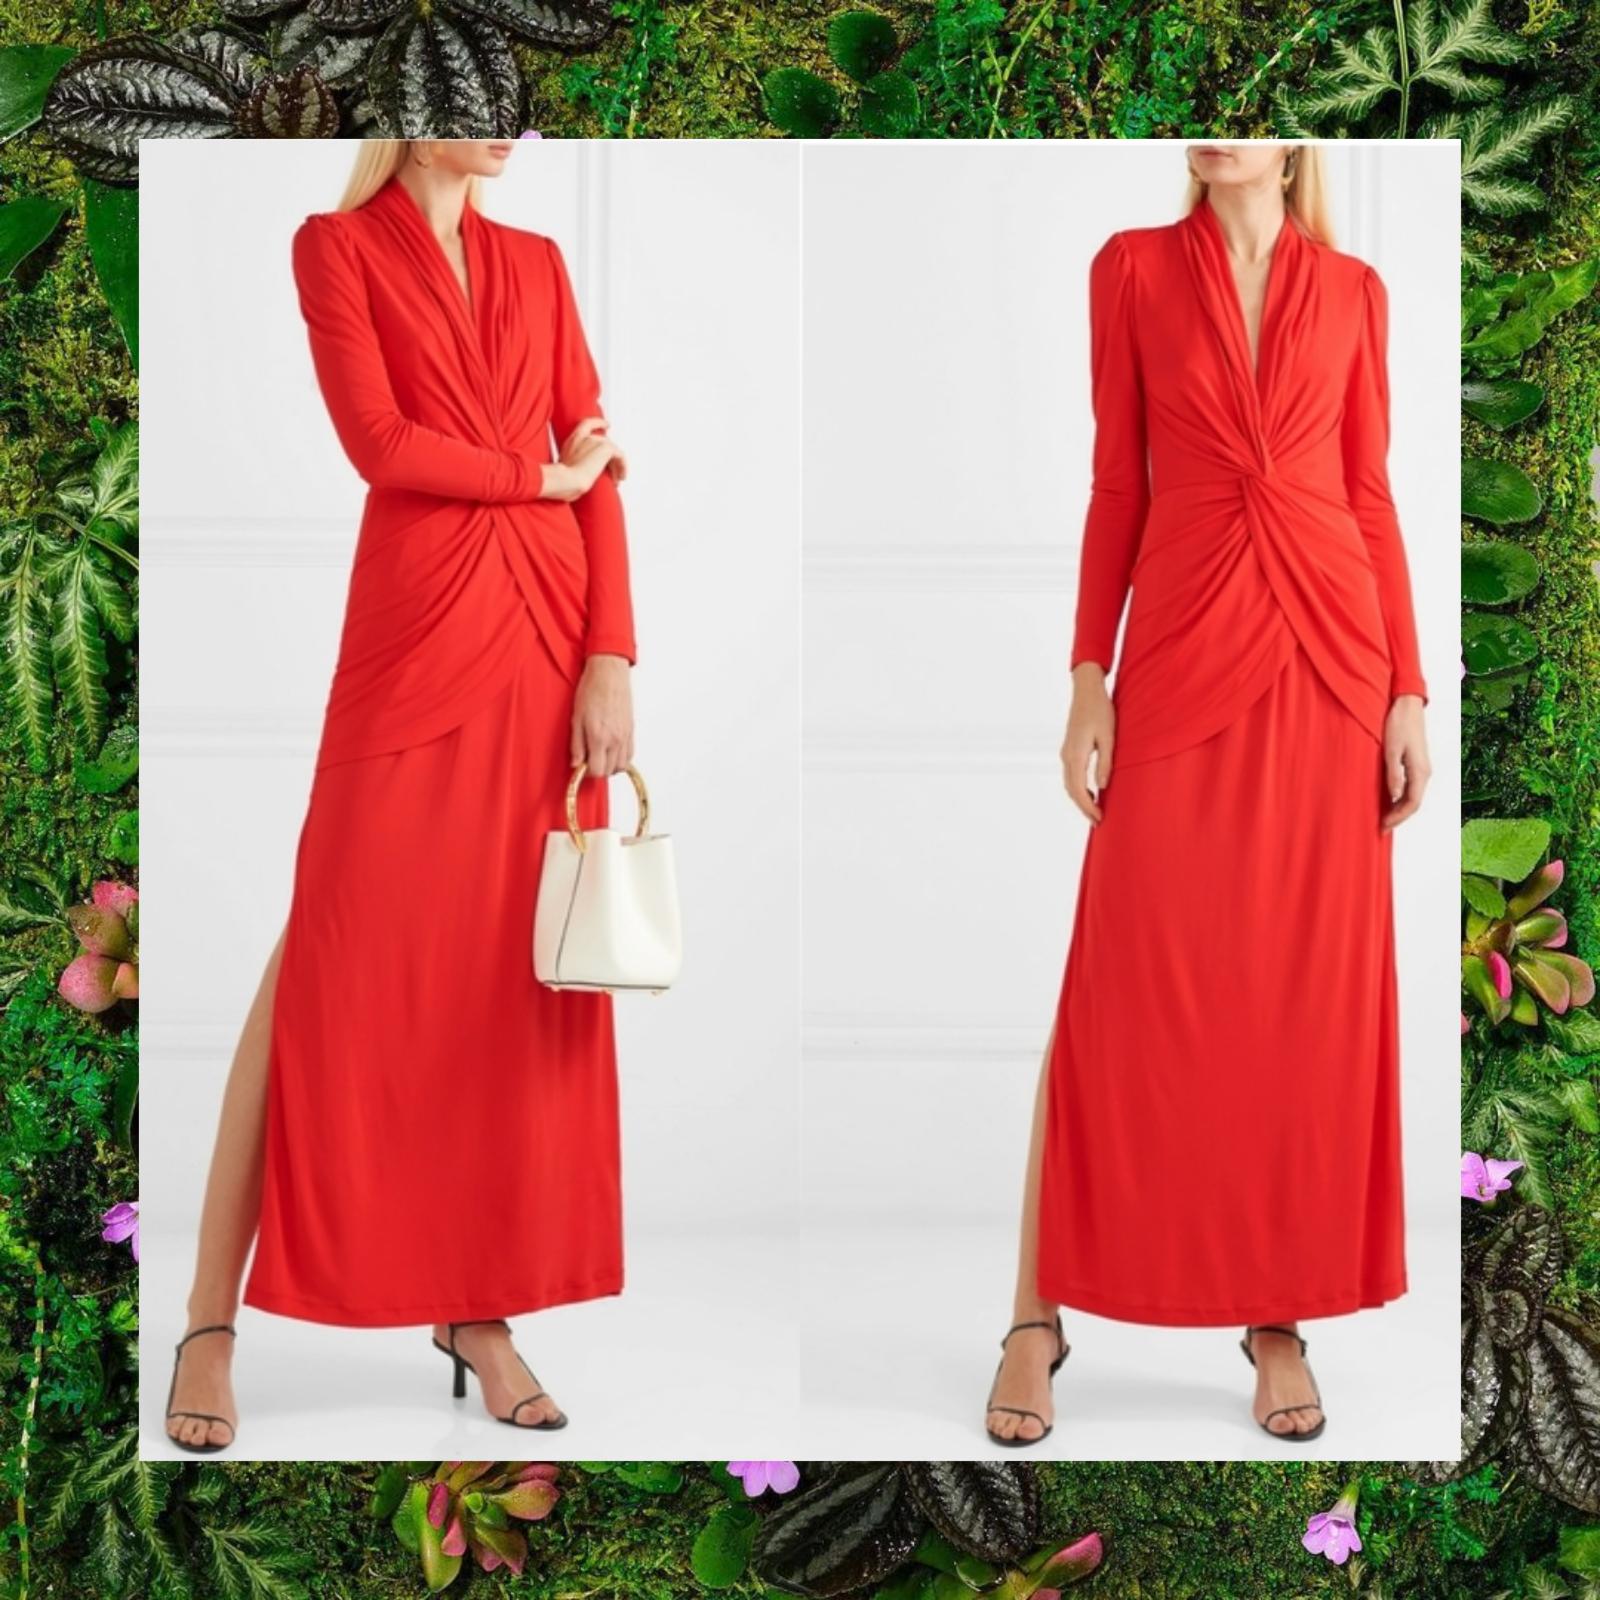 NWT DVF x NET-A-PORTER Red Stacia Long sleeve twist Maxi Dress 6 SMALL